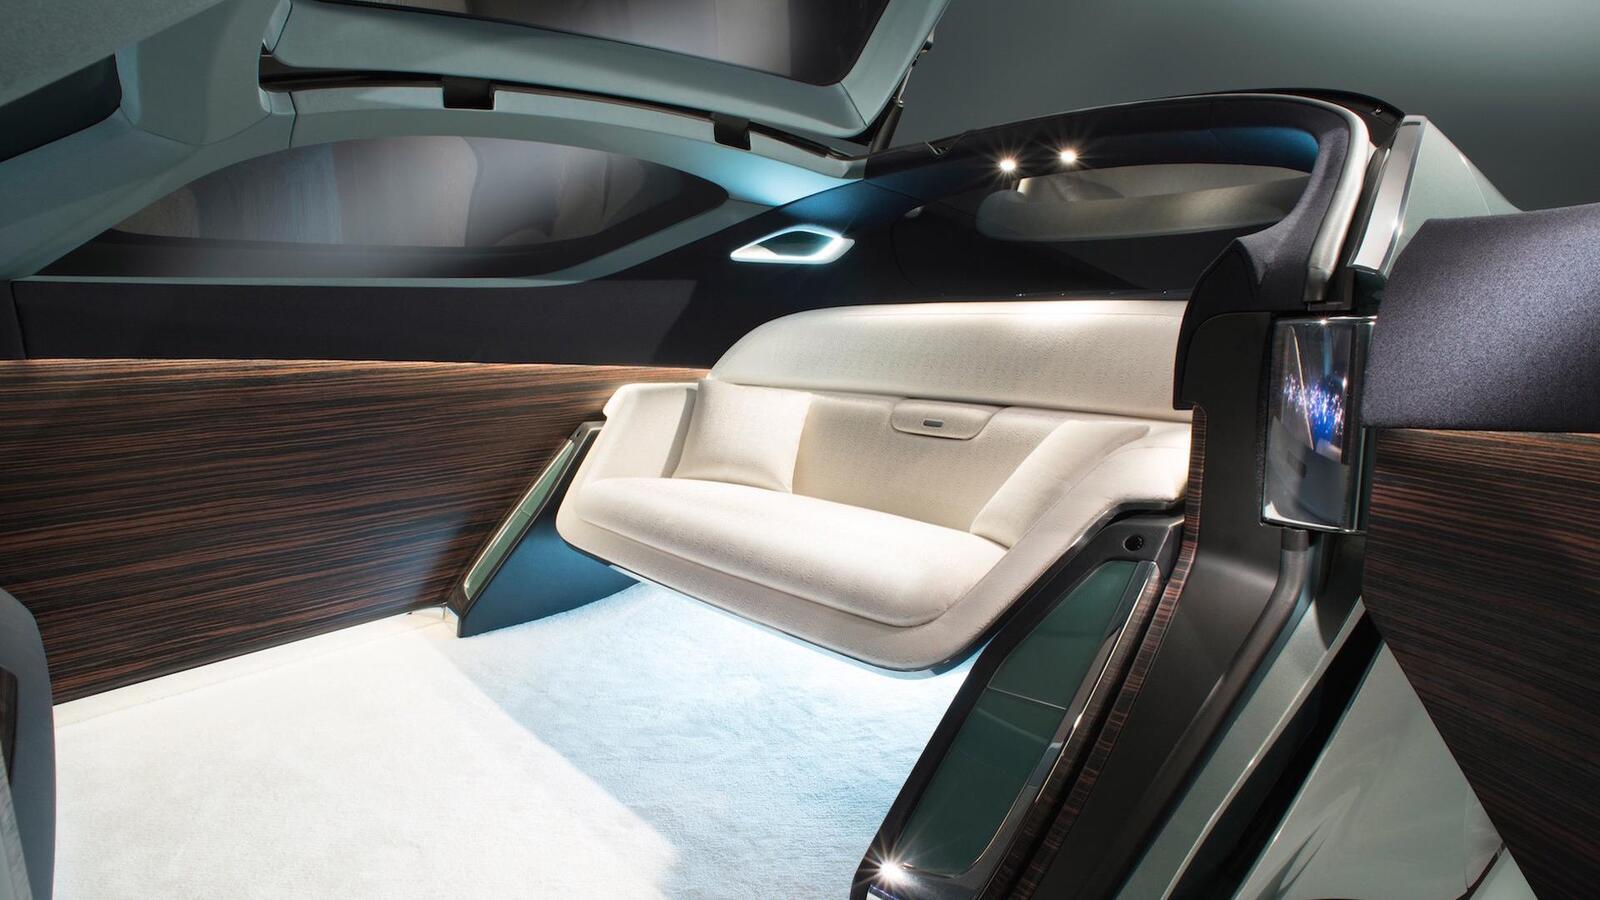 rolls-royce-vision-next-100-concept14.jpg